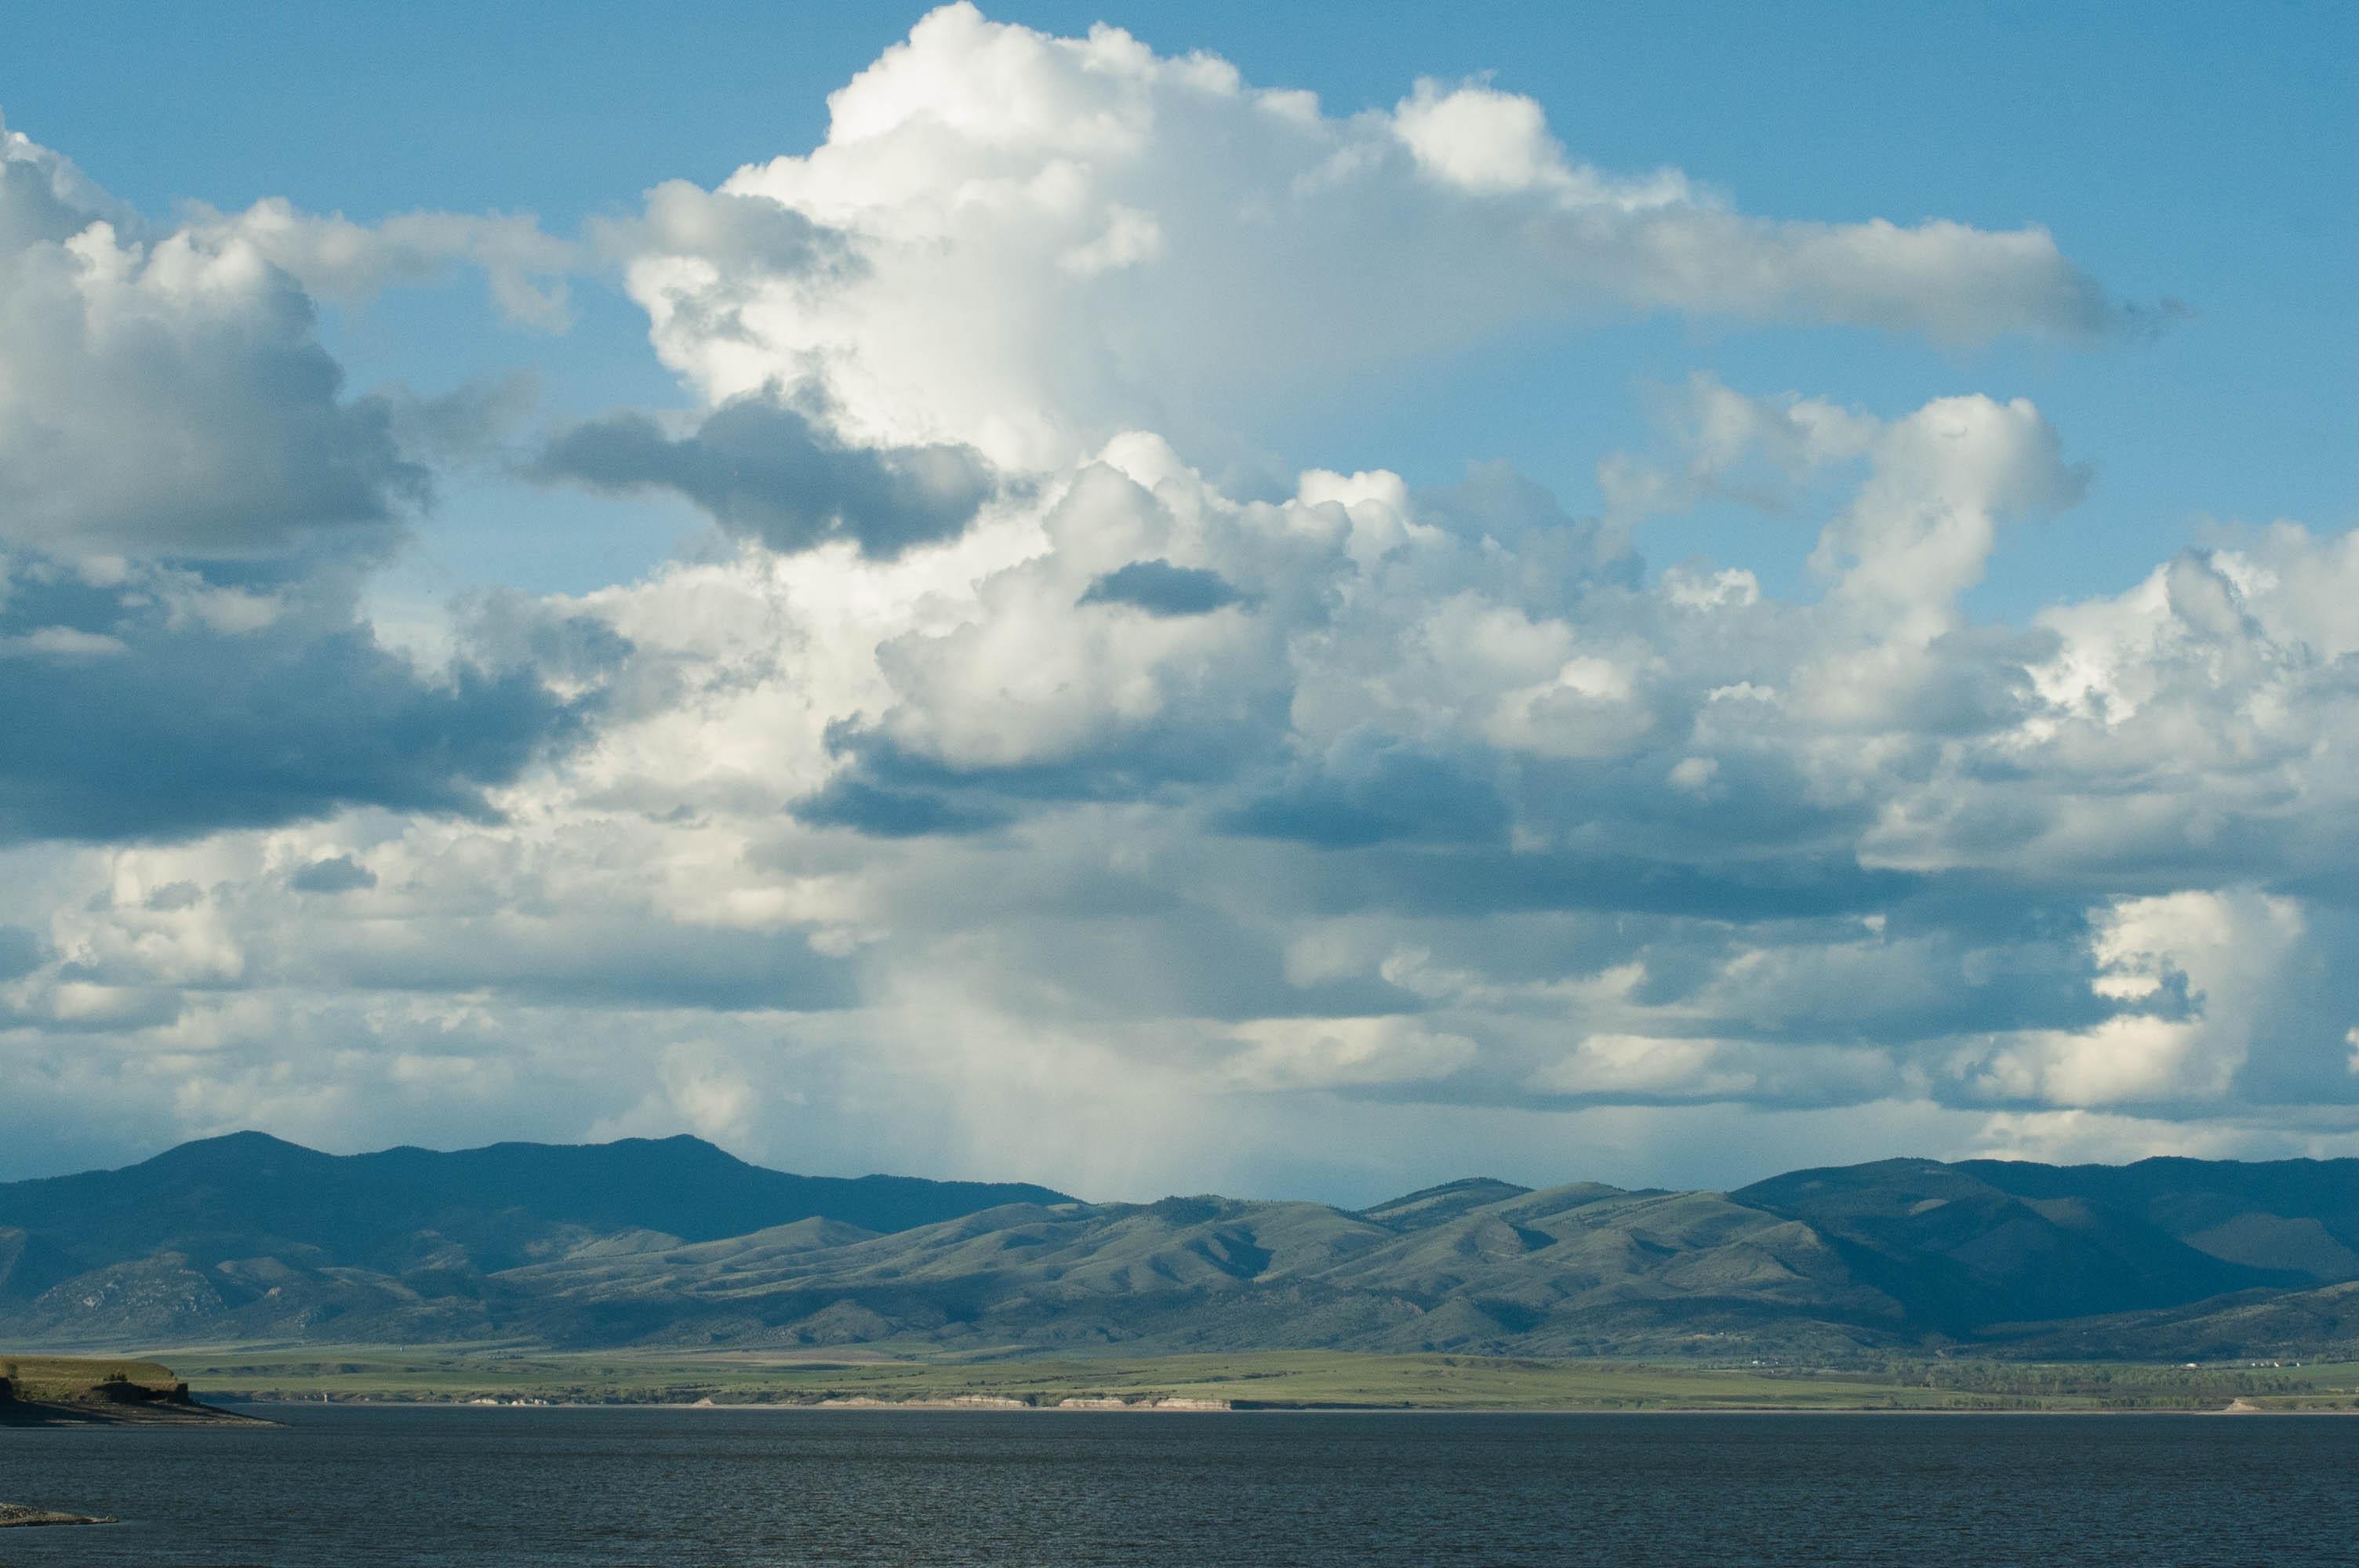 Townsend / Canyon Ferry Lake KOA Journey image 0